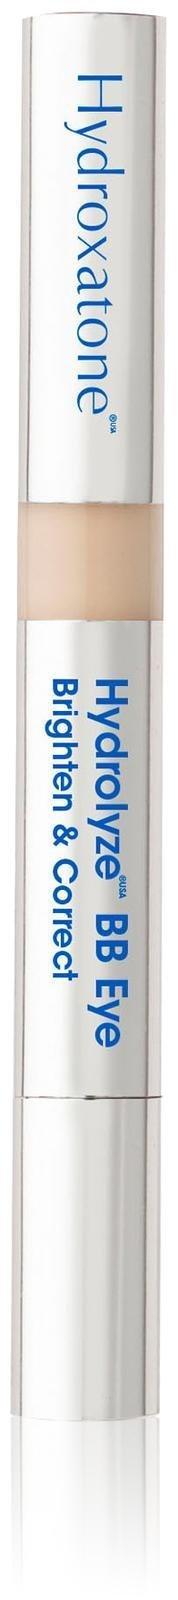 Hydroxatone Hydrolyze Bb Eye Brighten & Correct, Yellow, 0.07 Ounce